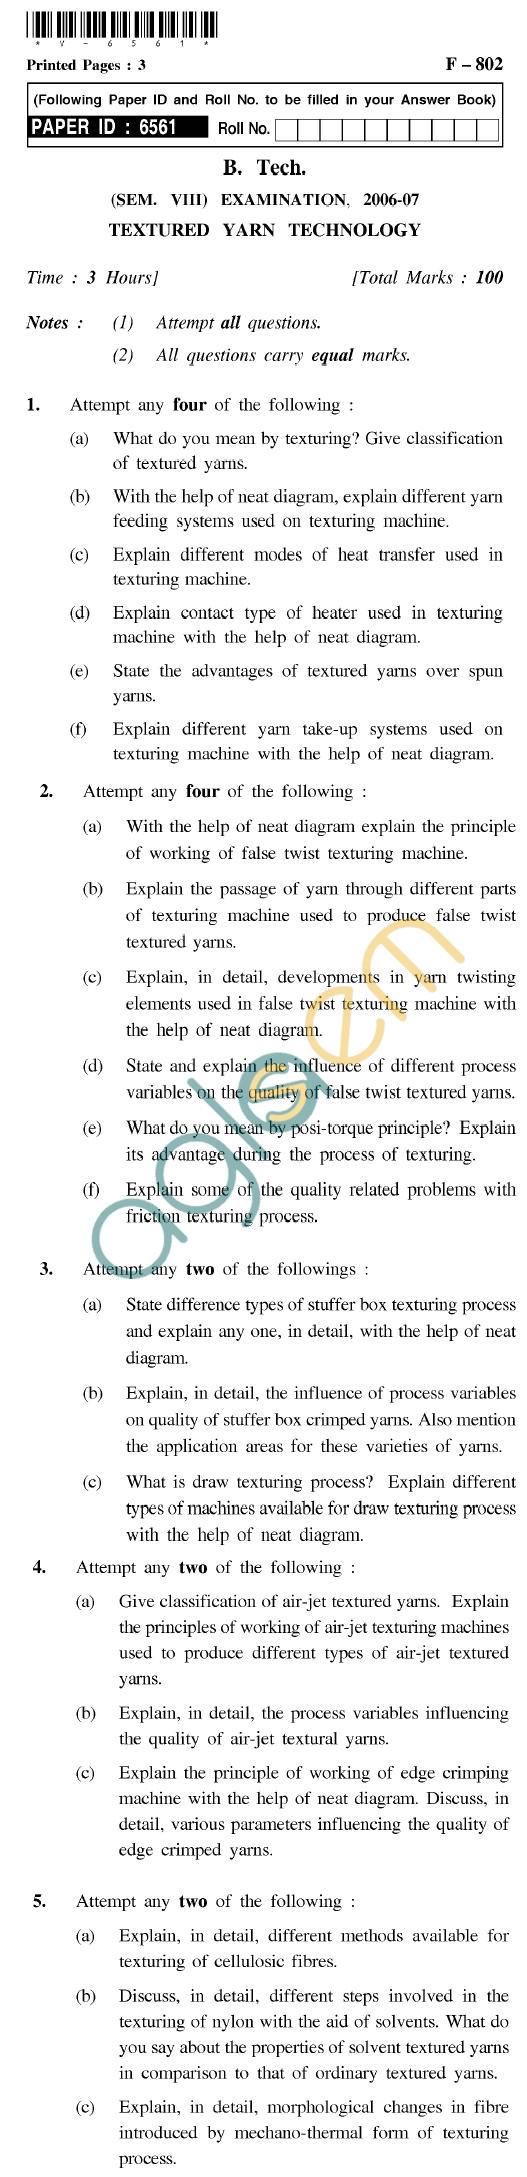 UPTU B.Tech Question Papers - F-802 - Textured Yarn Technology